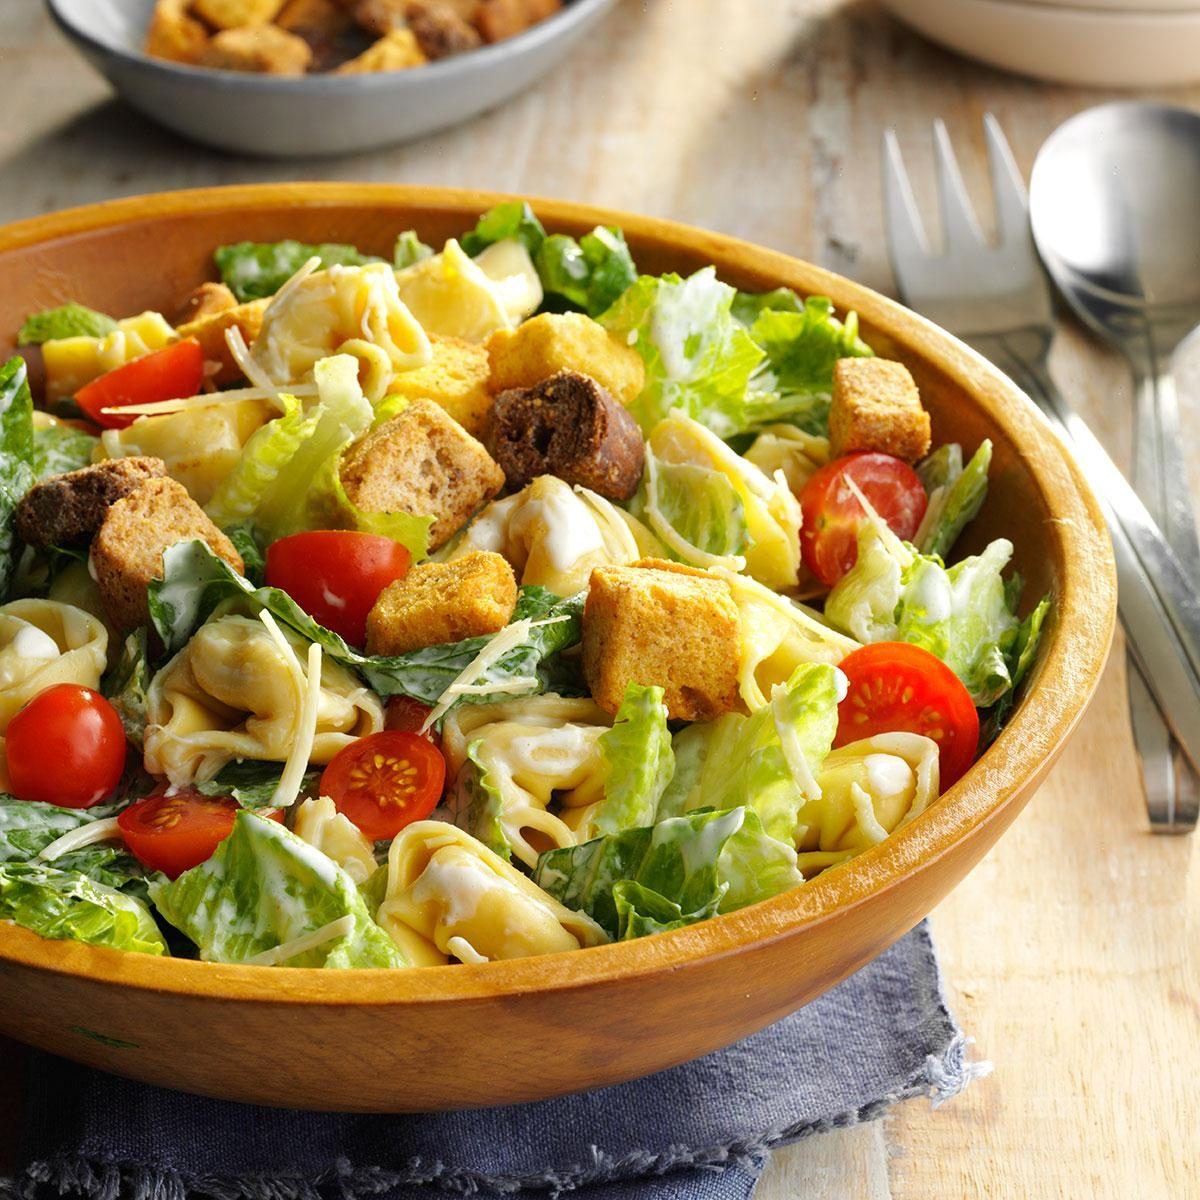 Make Ahead Dinner Party Ideas